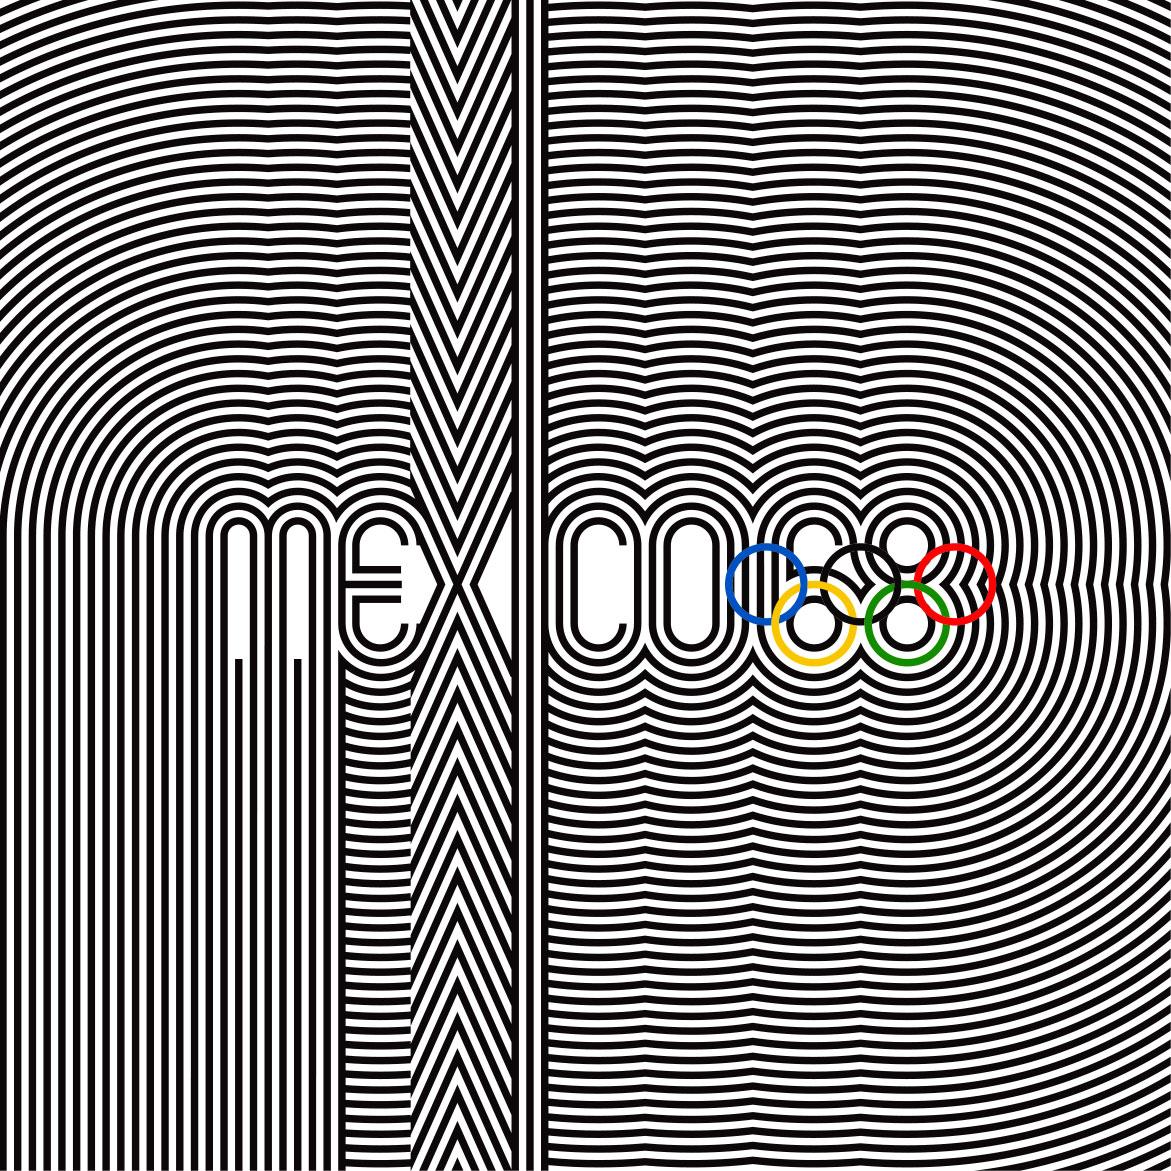 Mexico 68 Olympics branding by Lance Wyman